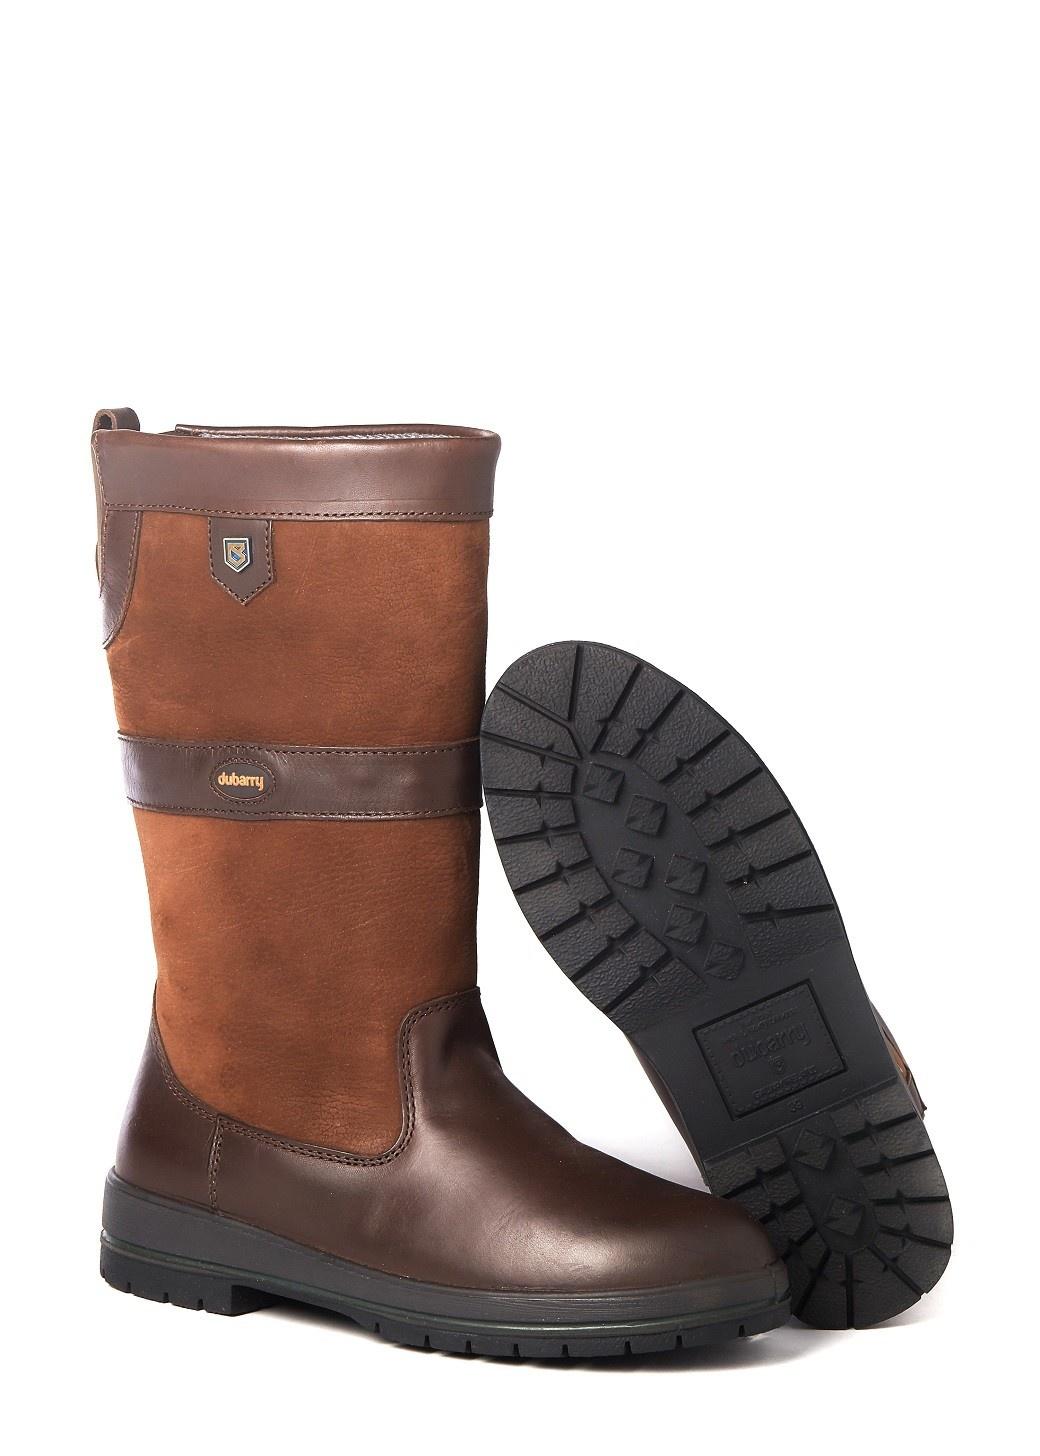 Dubarry Kildare outdoor laarzen - Walnut-4